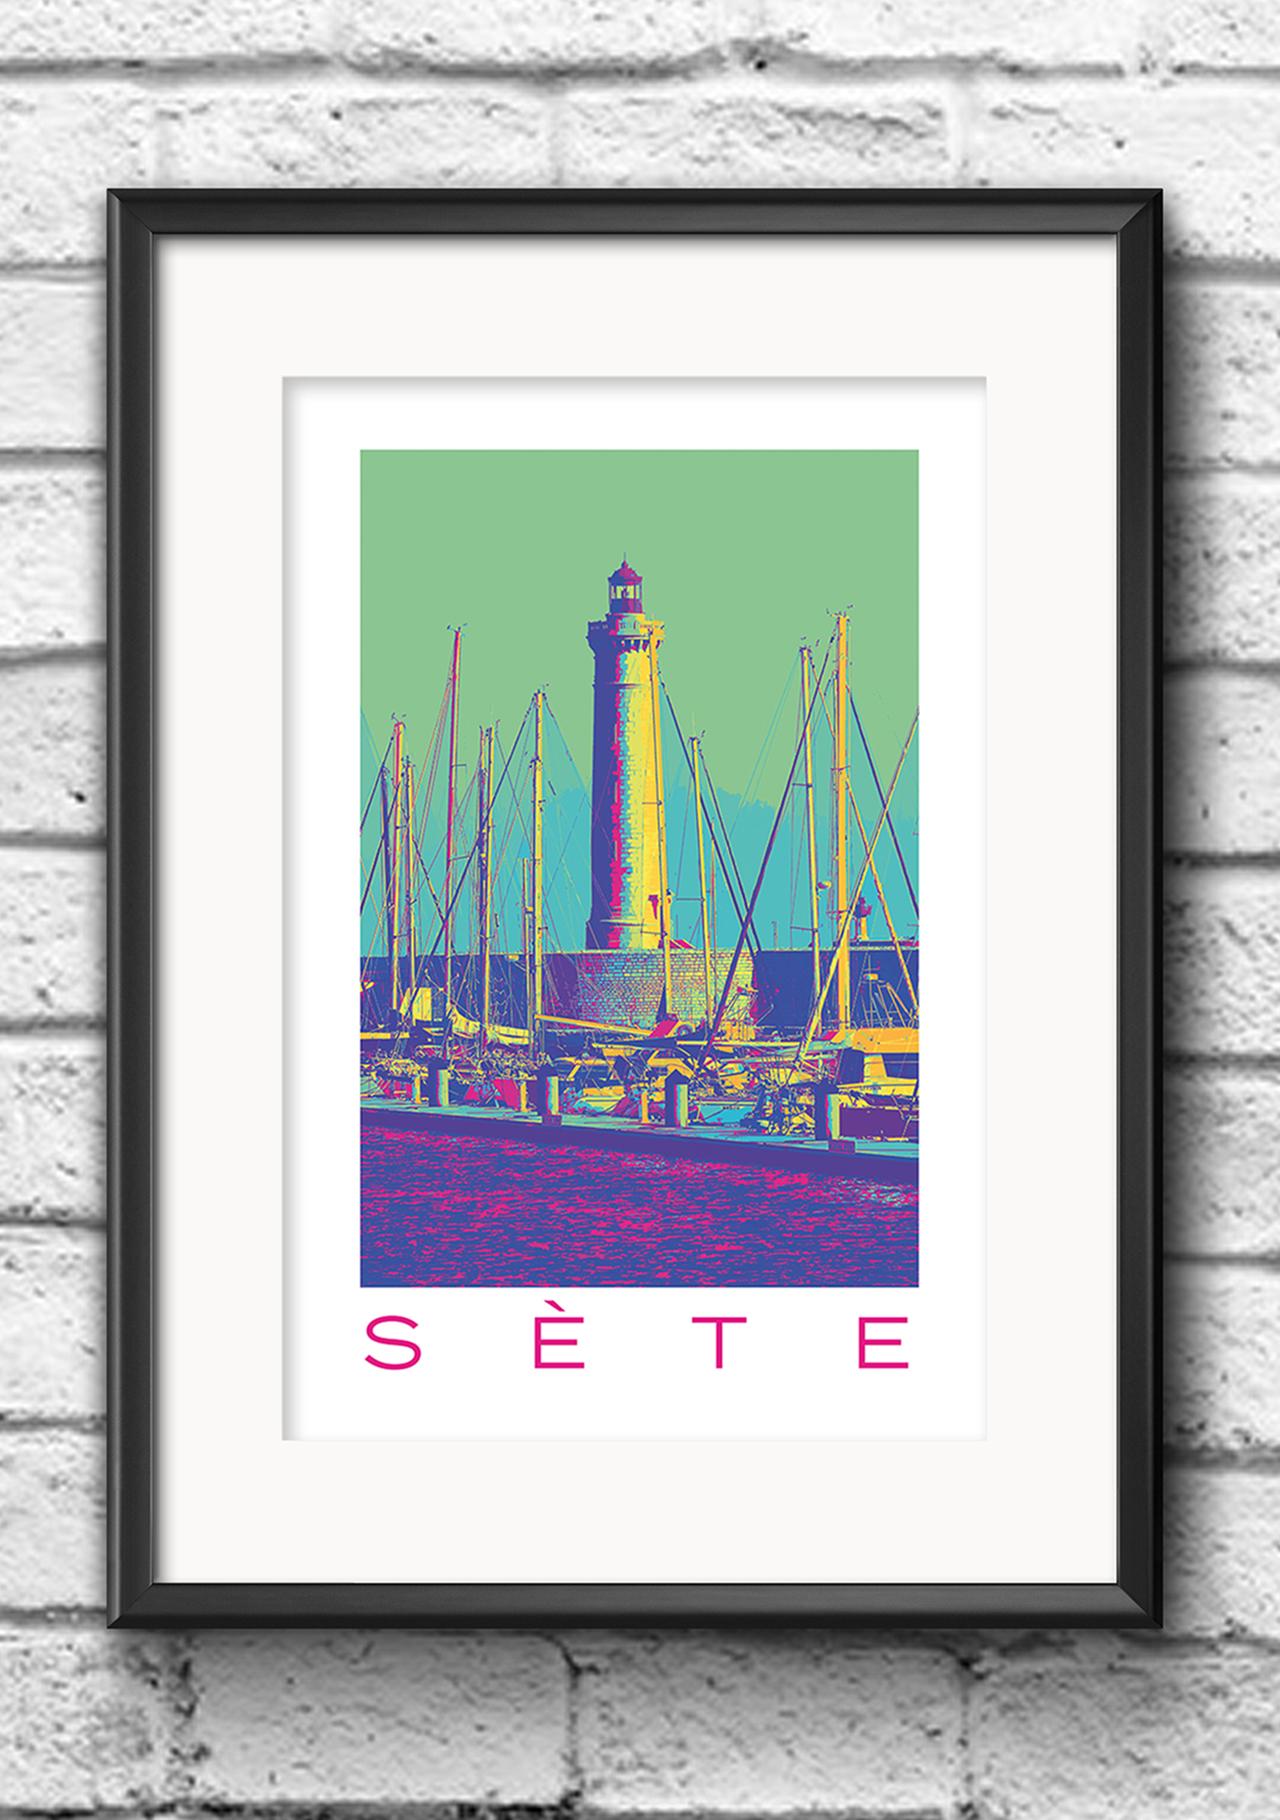 Modernes Wandbild Poster Popart Style Sete Frankreich Leuchtturm bunt